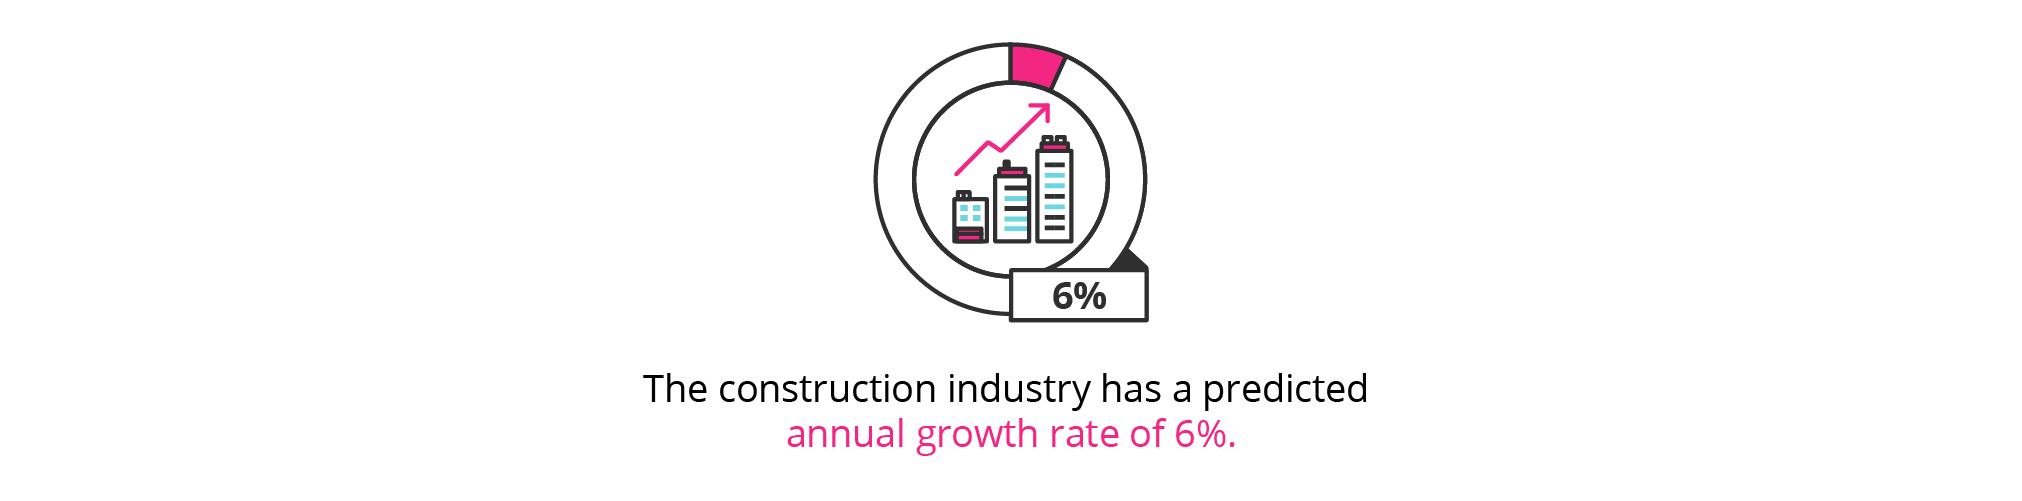 ConstructionManager_Infostat